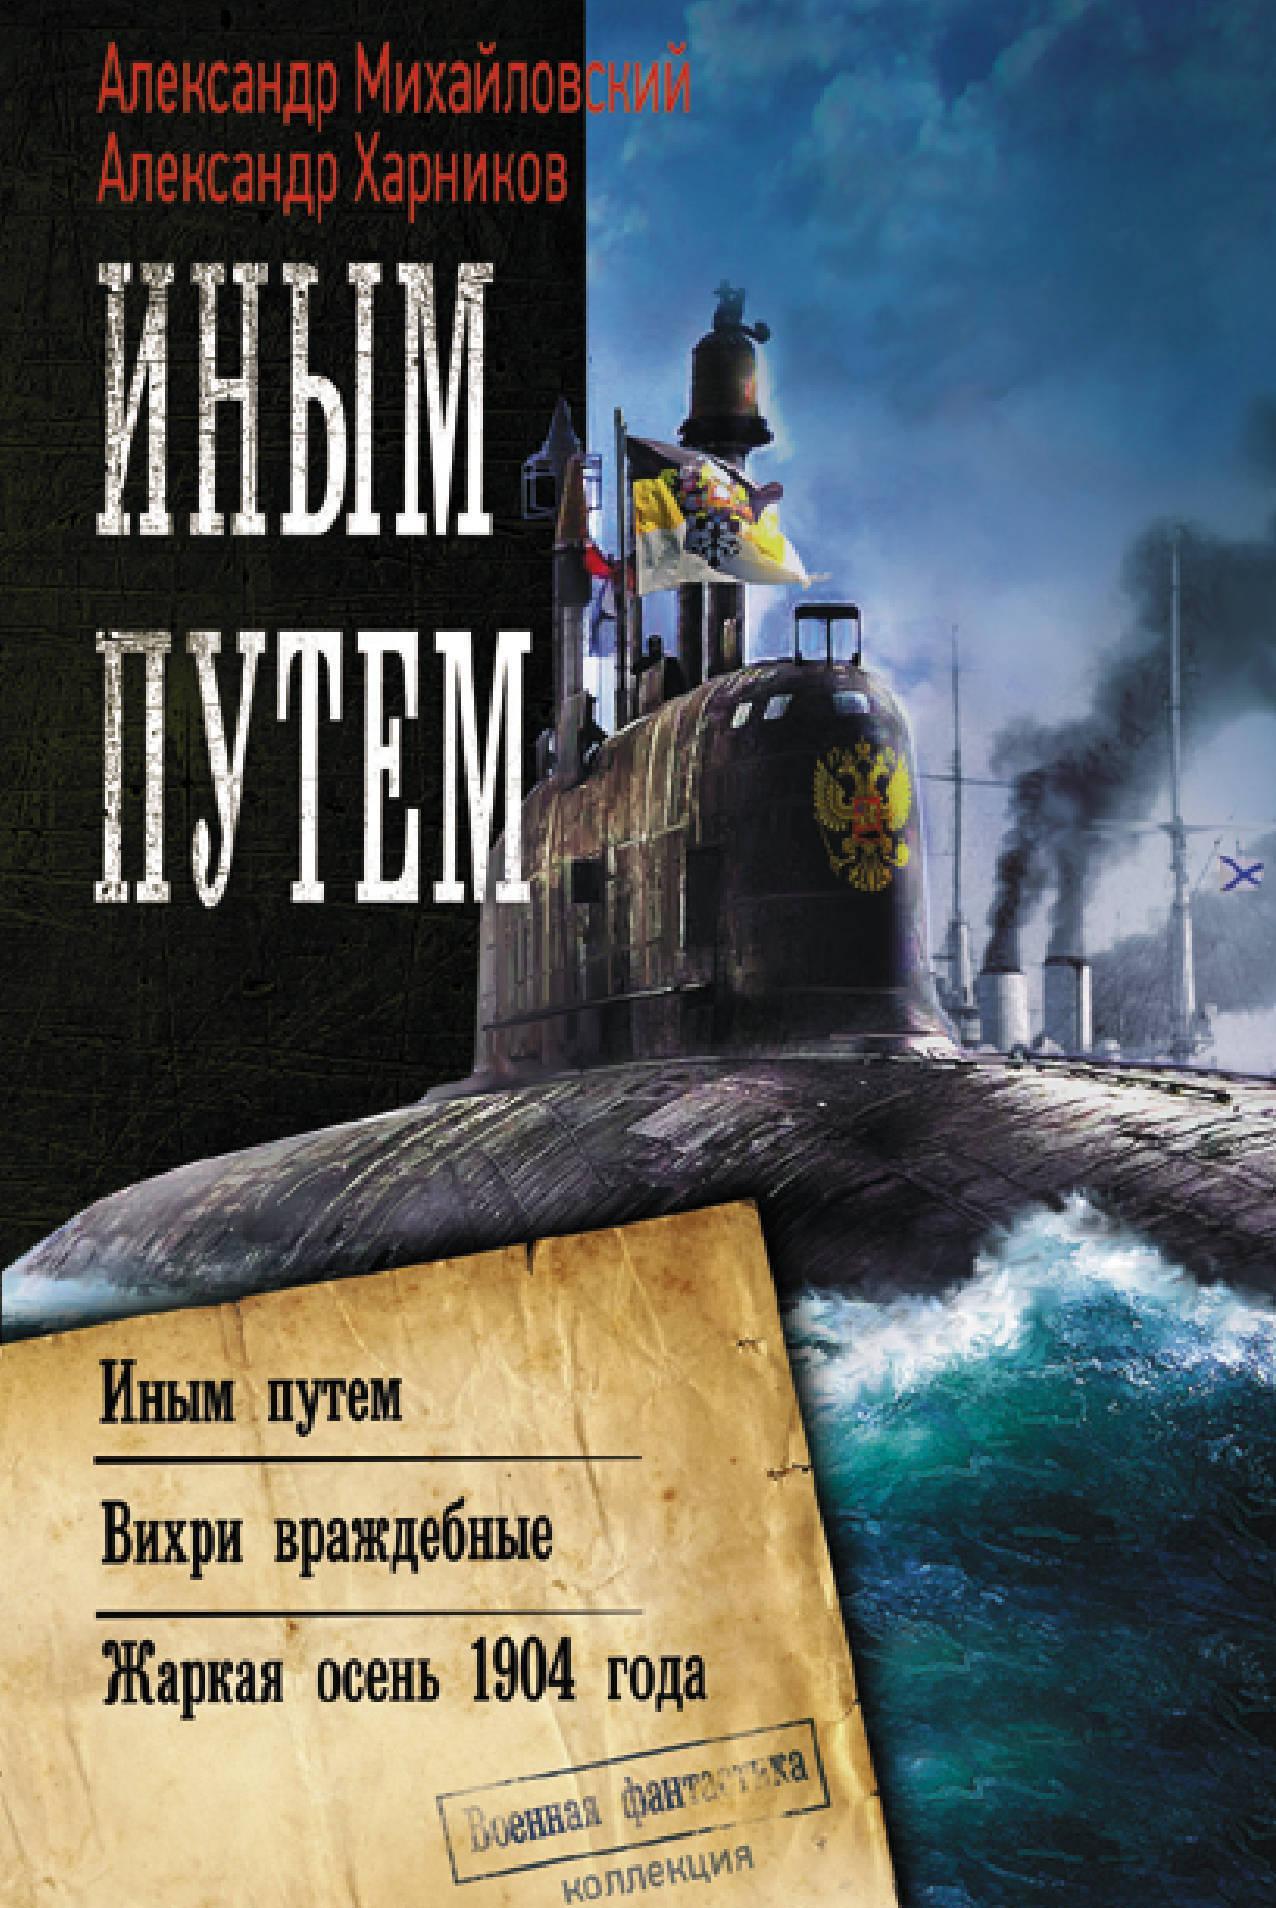 Inym putem | Mikhajlovskij Aleksandr Borisovich, Kharnikov Aleksandr Petrovich